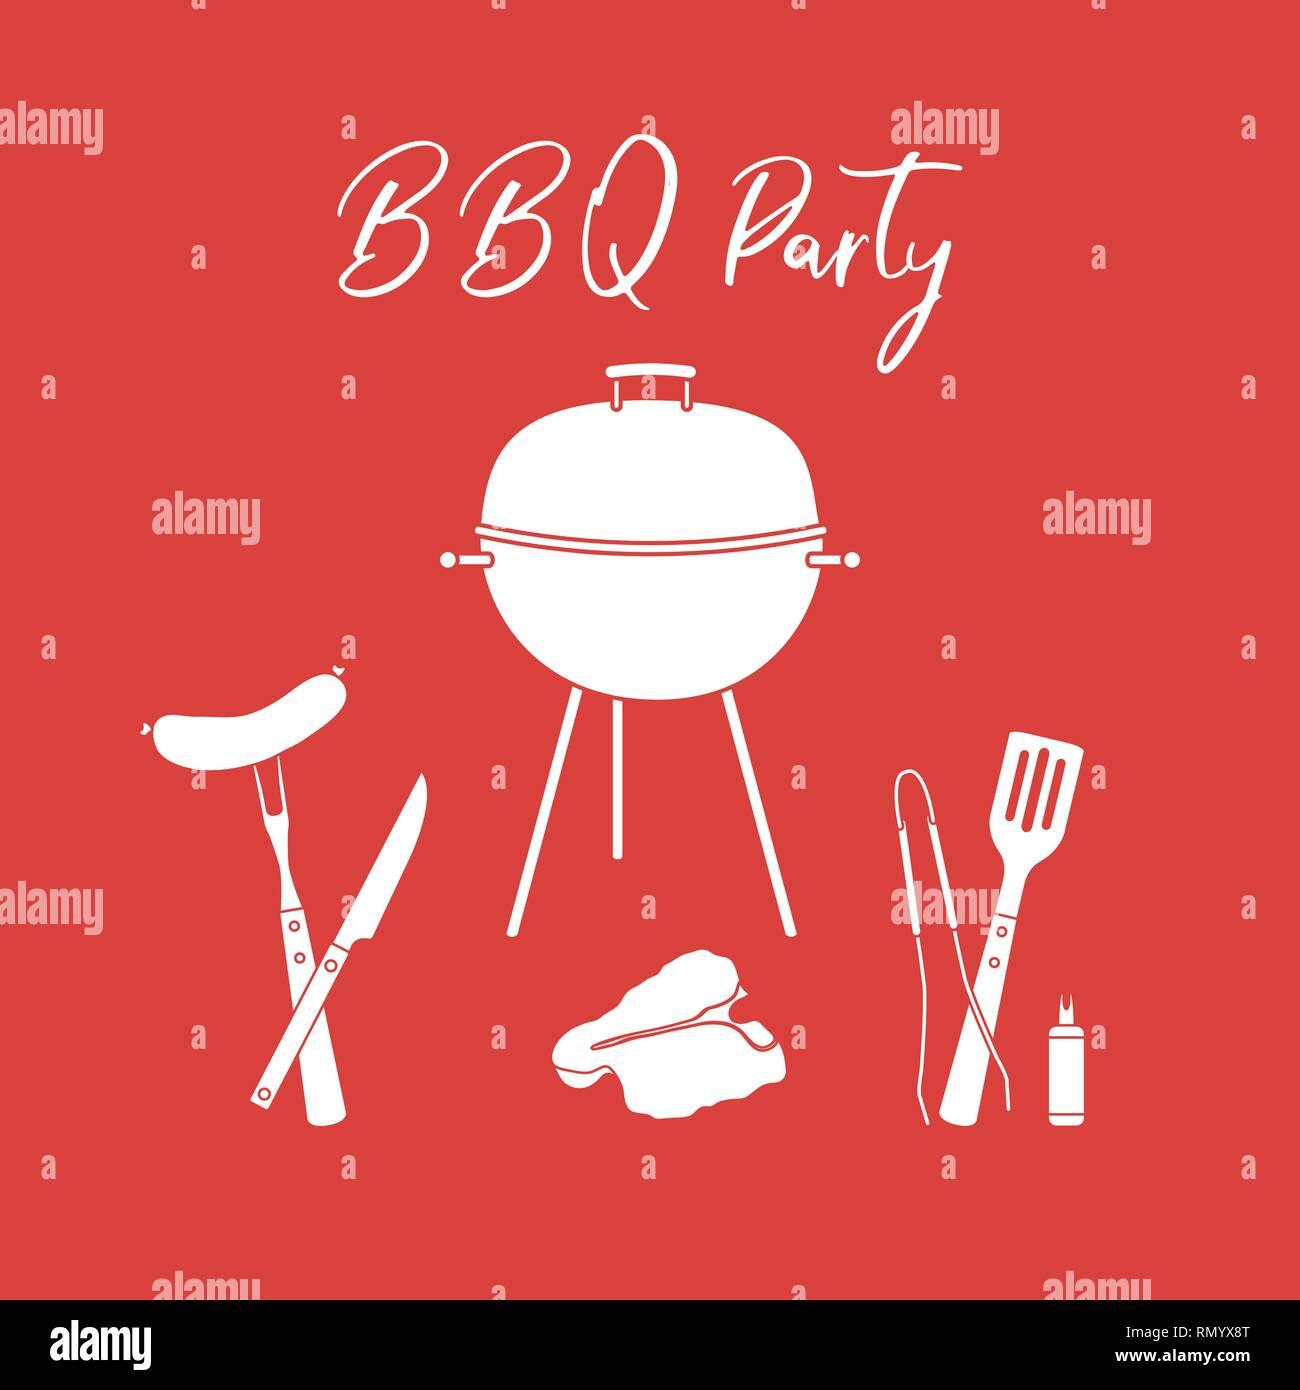 Affiche De Barbecue Vector Illustration. Griller Les Outils